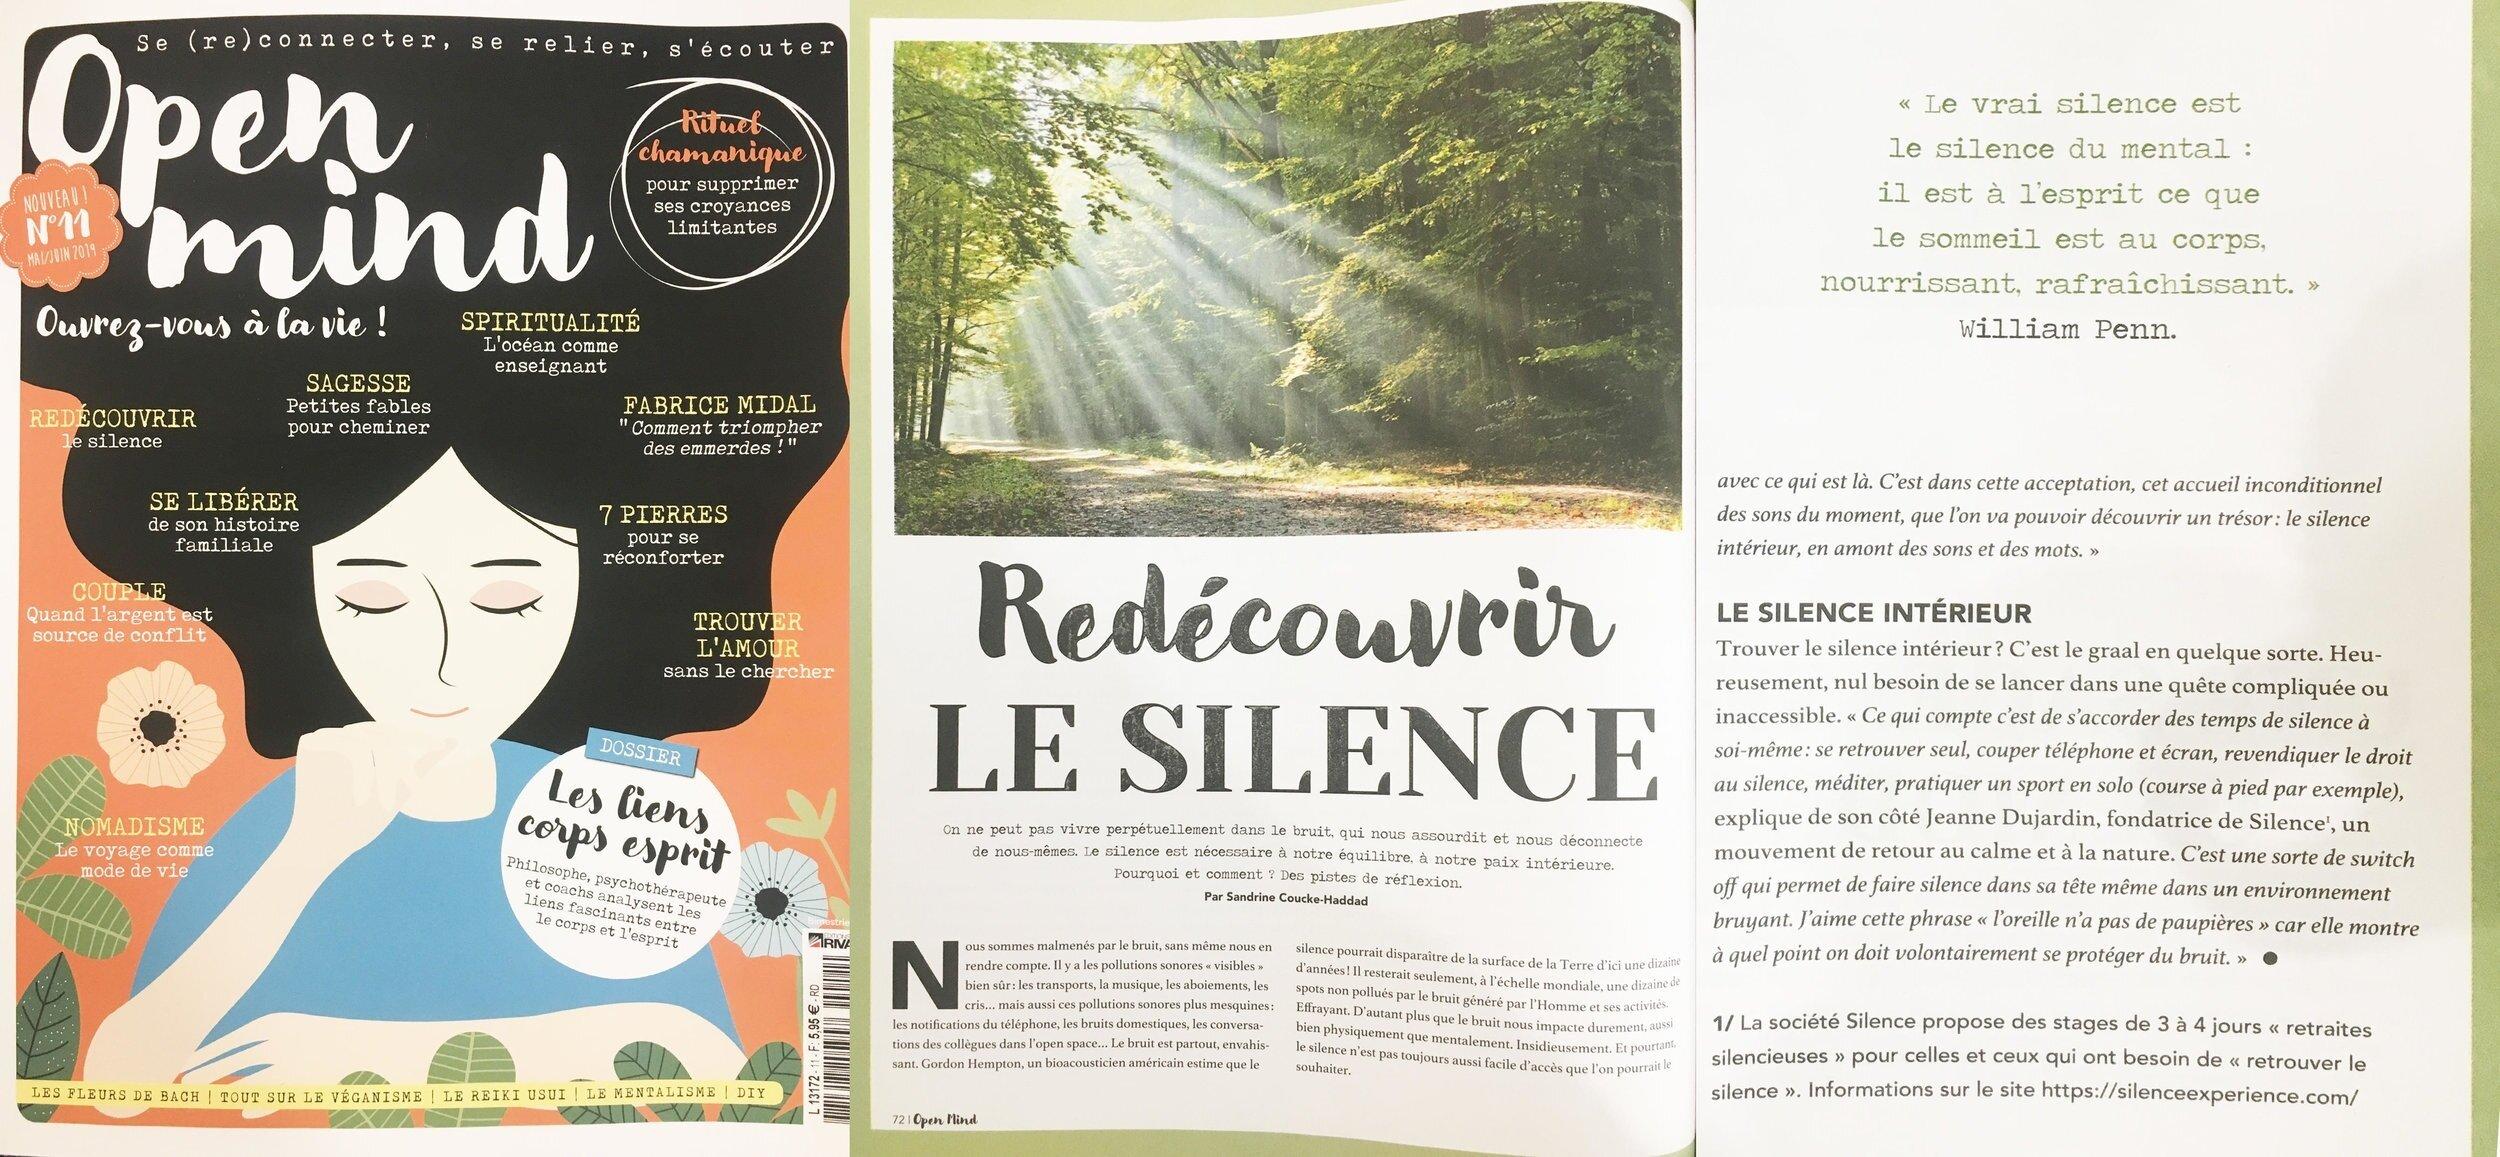 Open Mind Magazine. Article sur Silence -